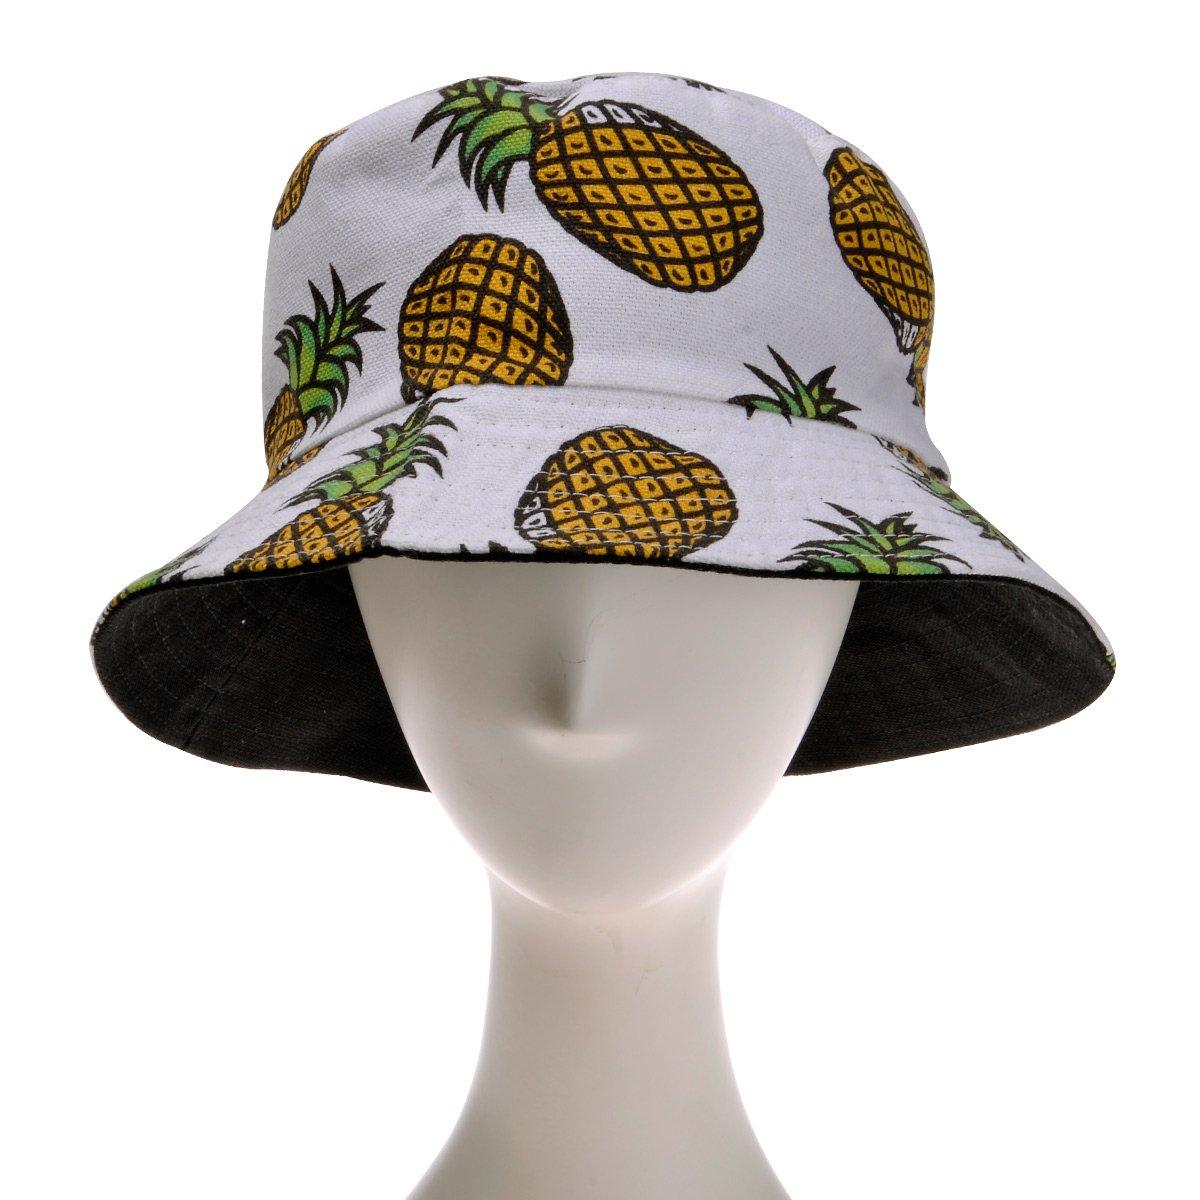 8da7de68771 ZLYC Unisex Cute Pineapple Print Bucket Hat Summer Fisherman Cap ...